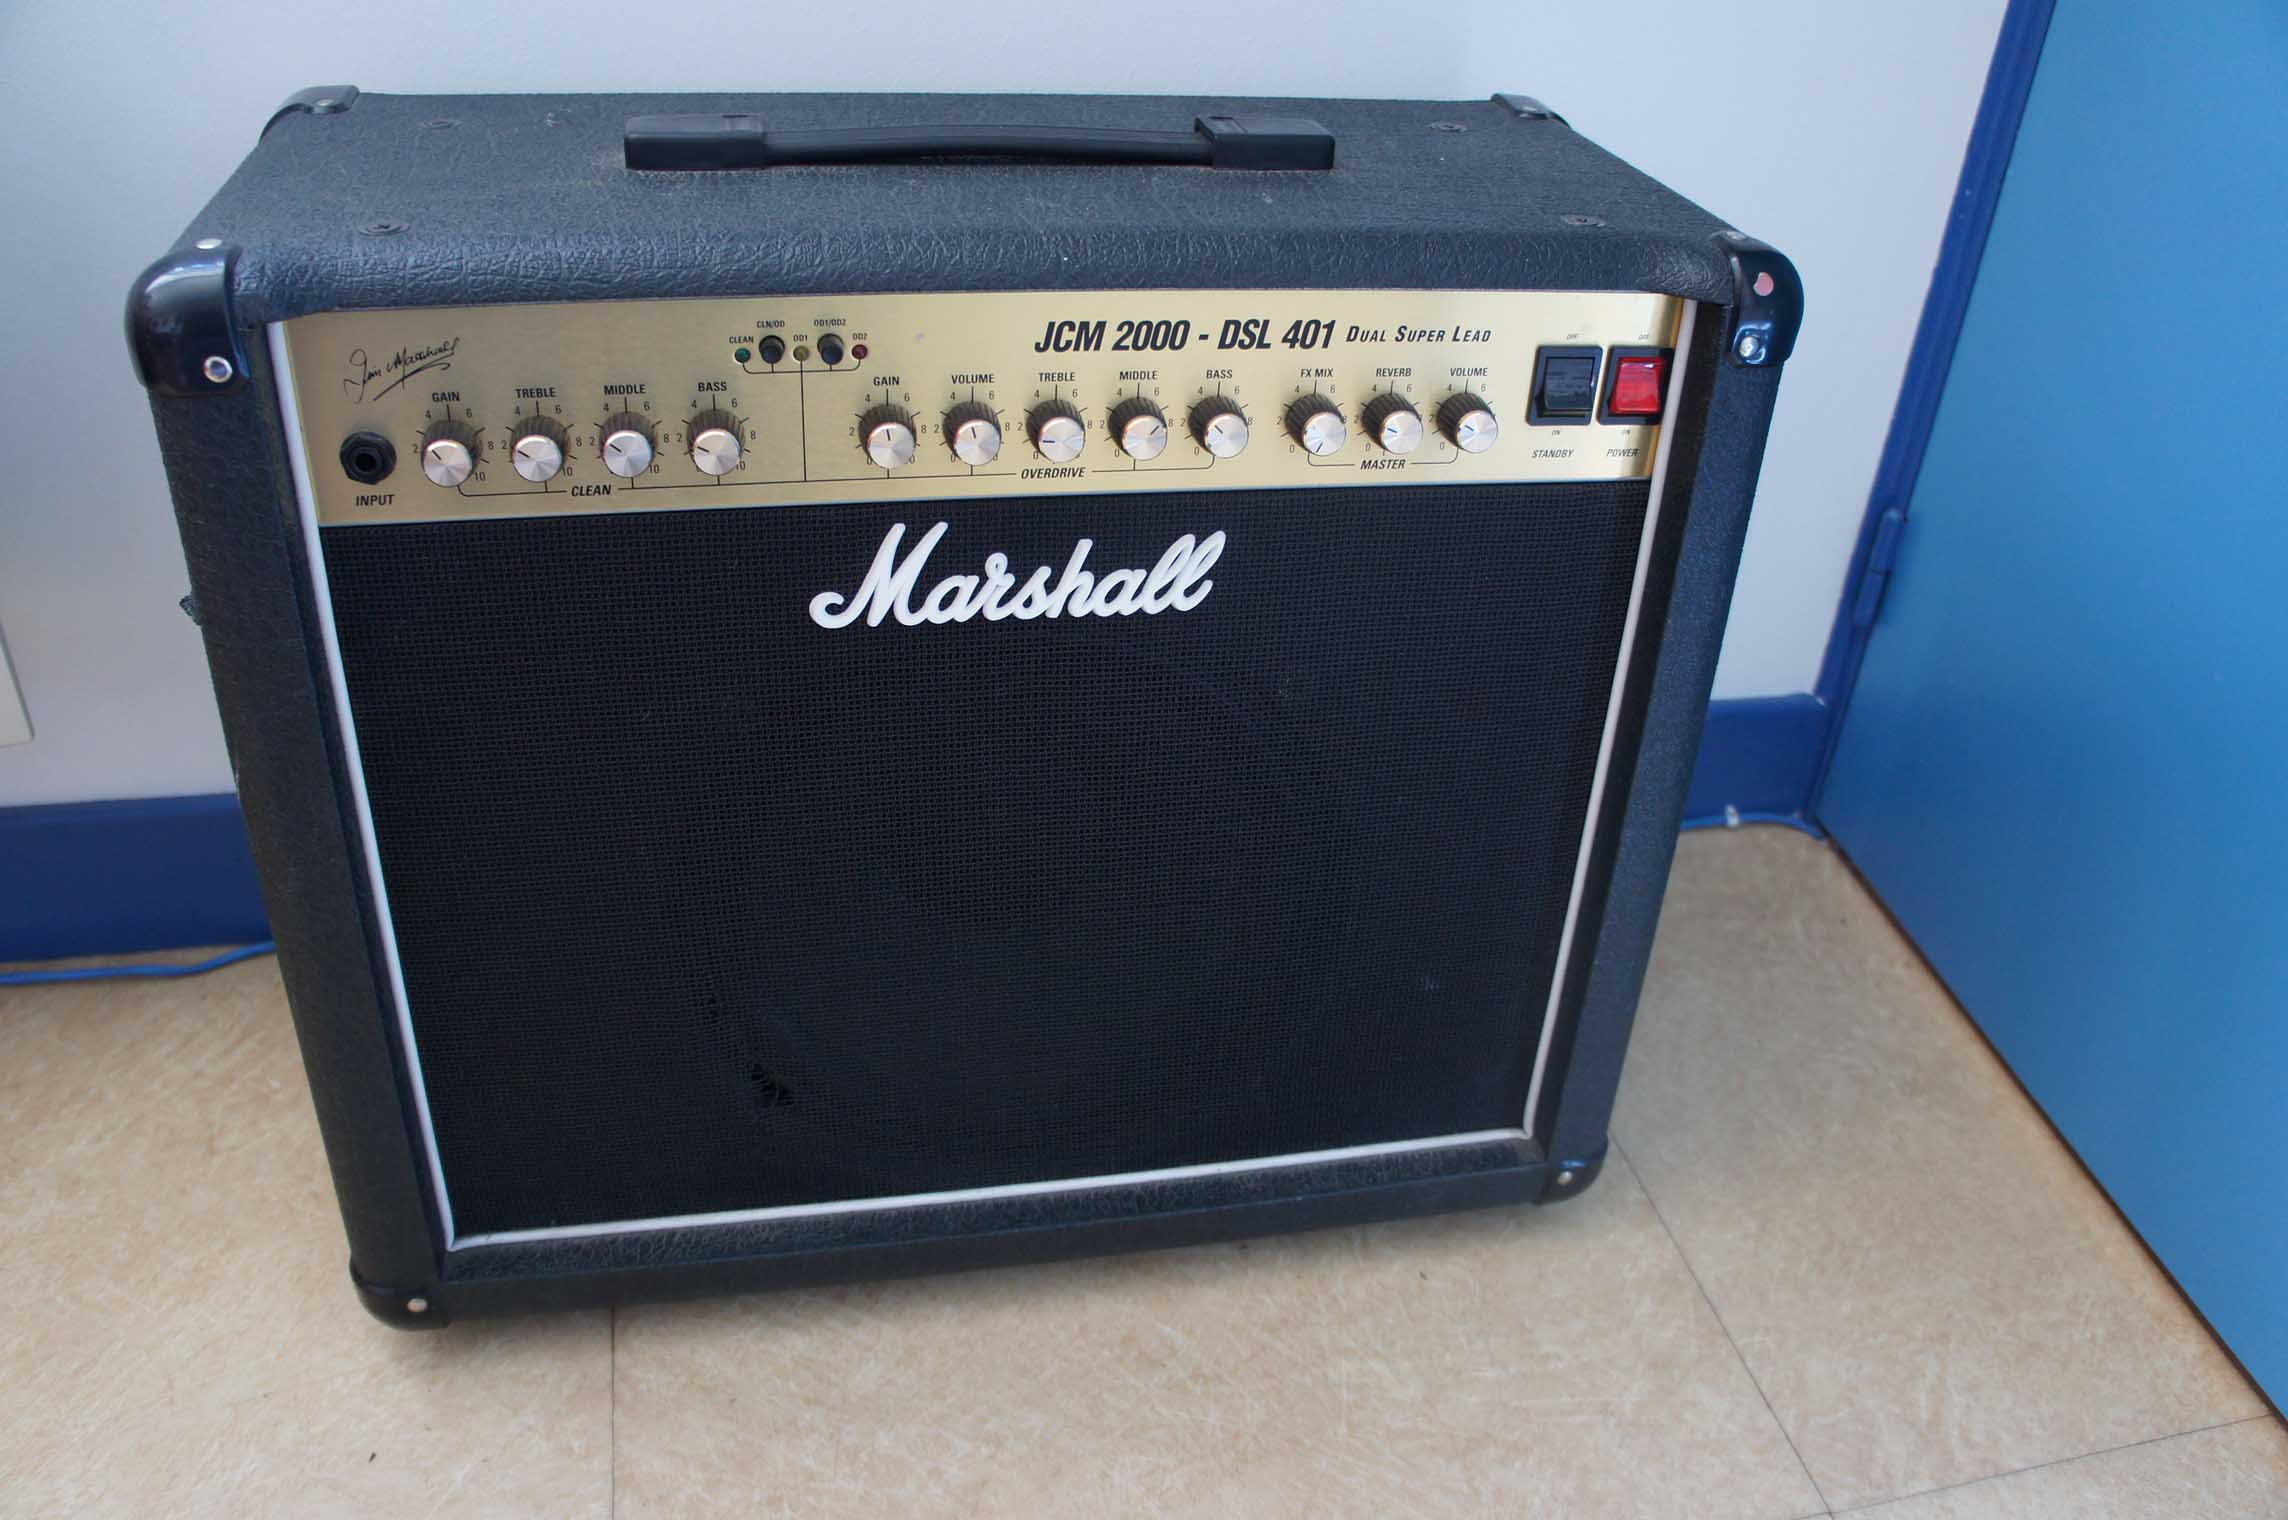 marshall dsl401 1997 image 445560 audiofanzine. Black Bedroom Furniture Sets. Home Design Ideas